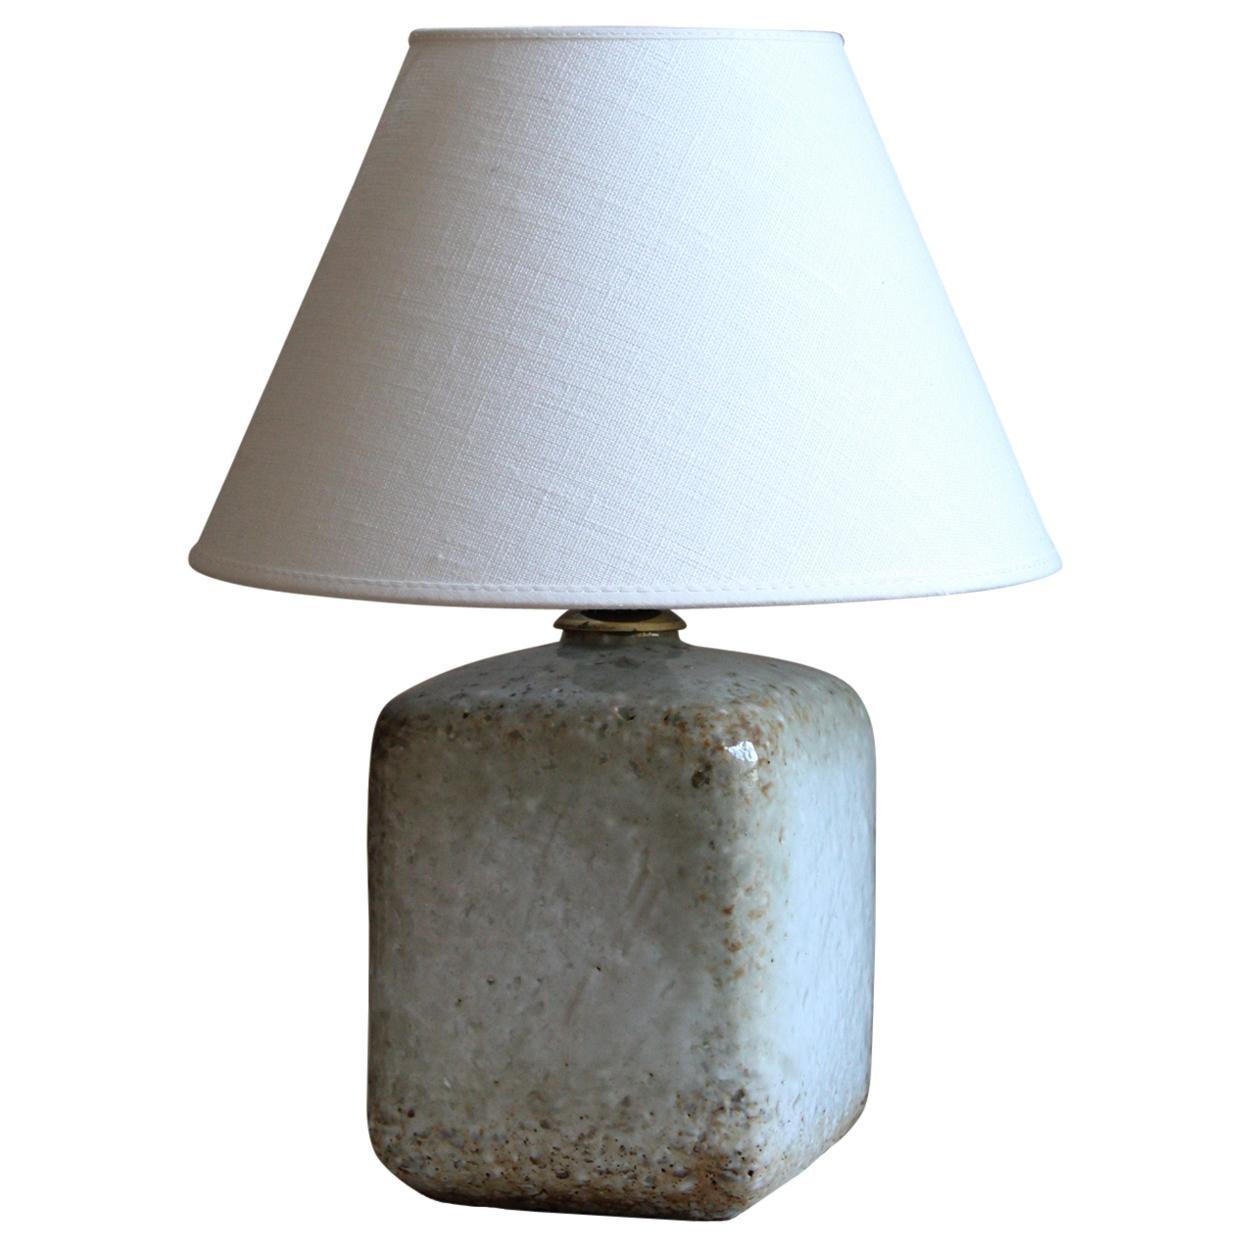 Gunnar Nylund, Table Lamp, Glazed Firesand, Rörstand, Linen, Sweden, 1950s